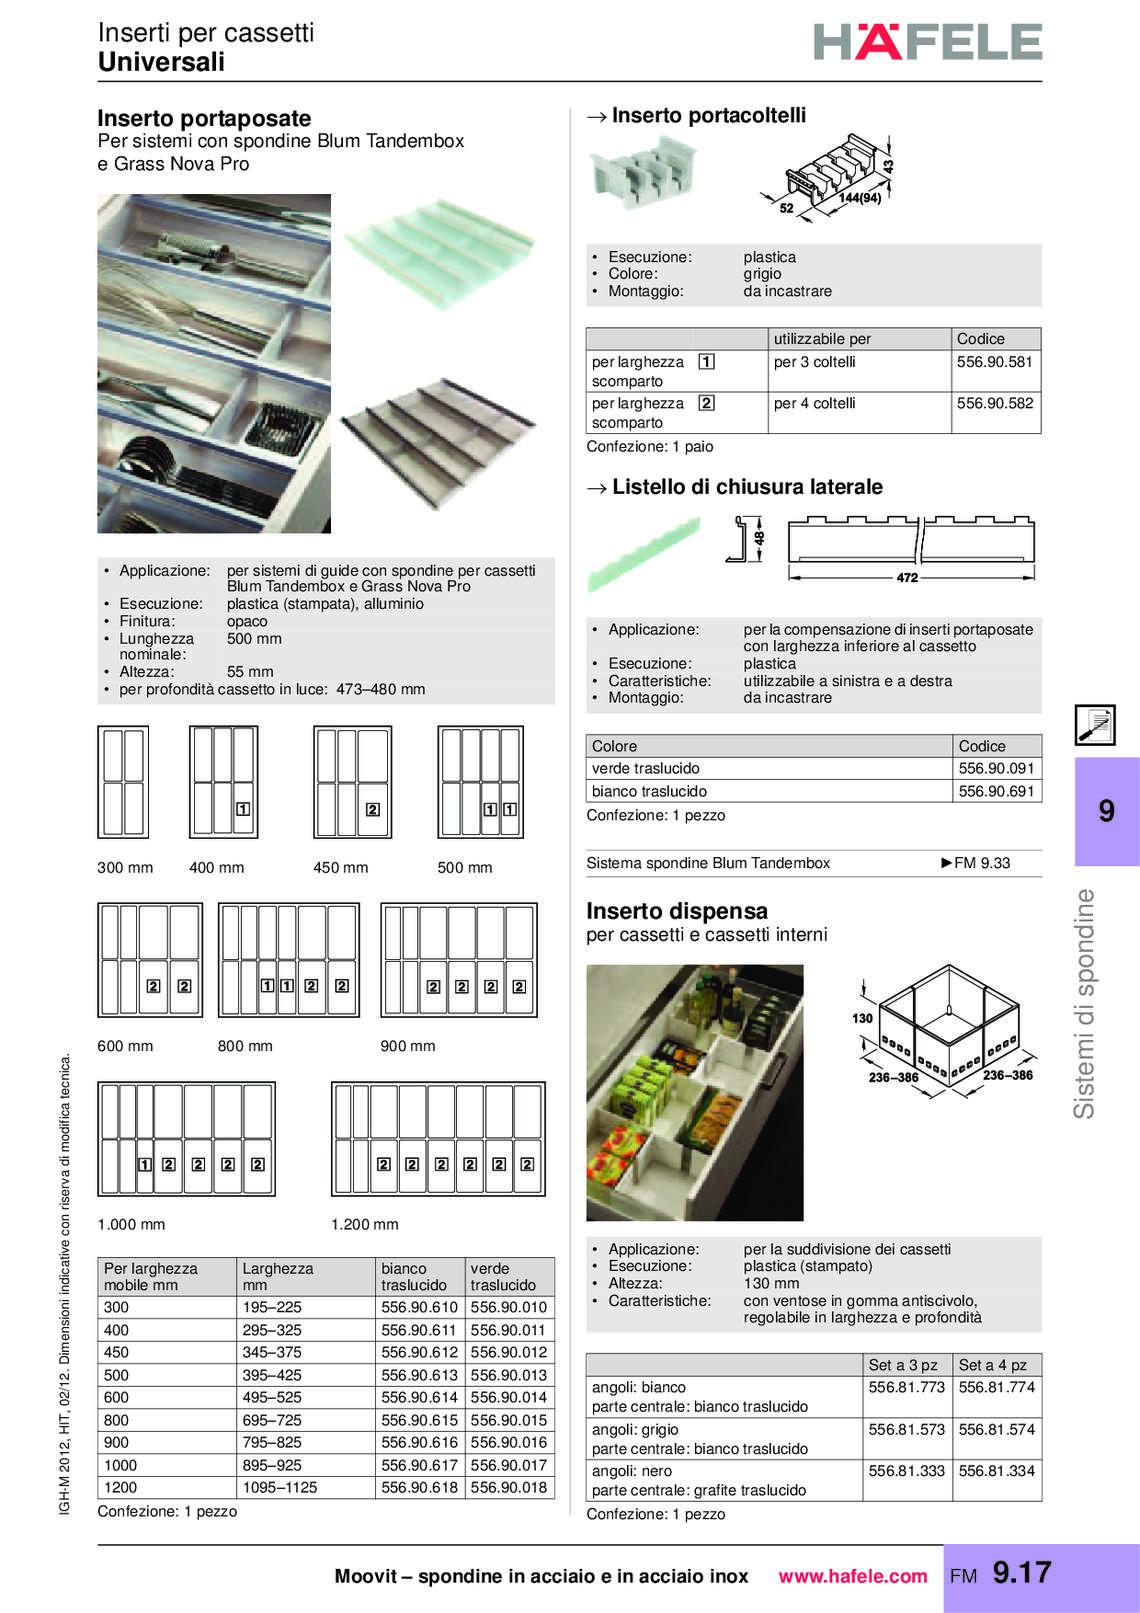 hafele-spondine-e-guide-per-mobili_40_030.jpg